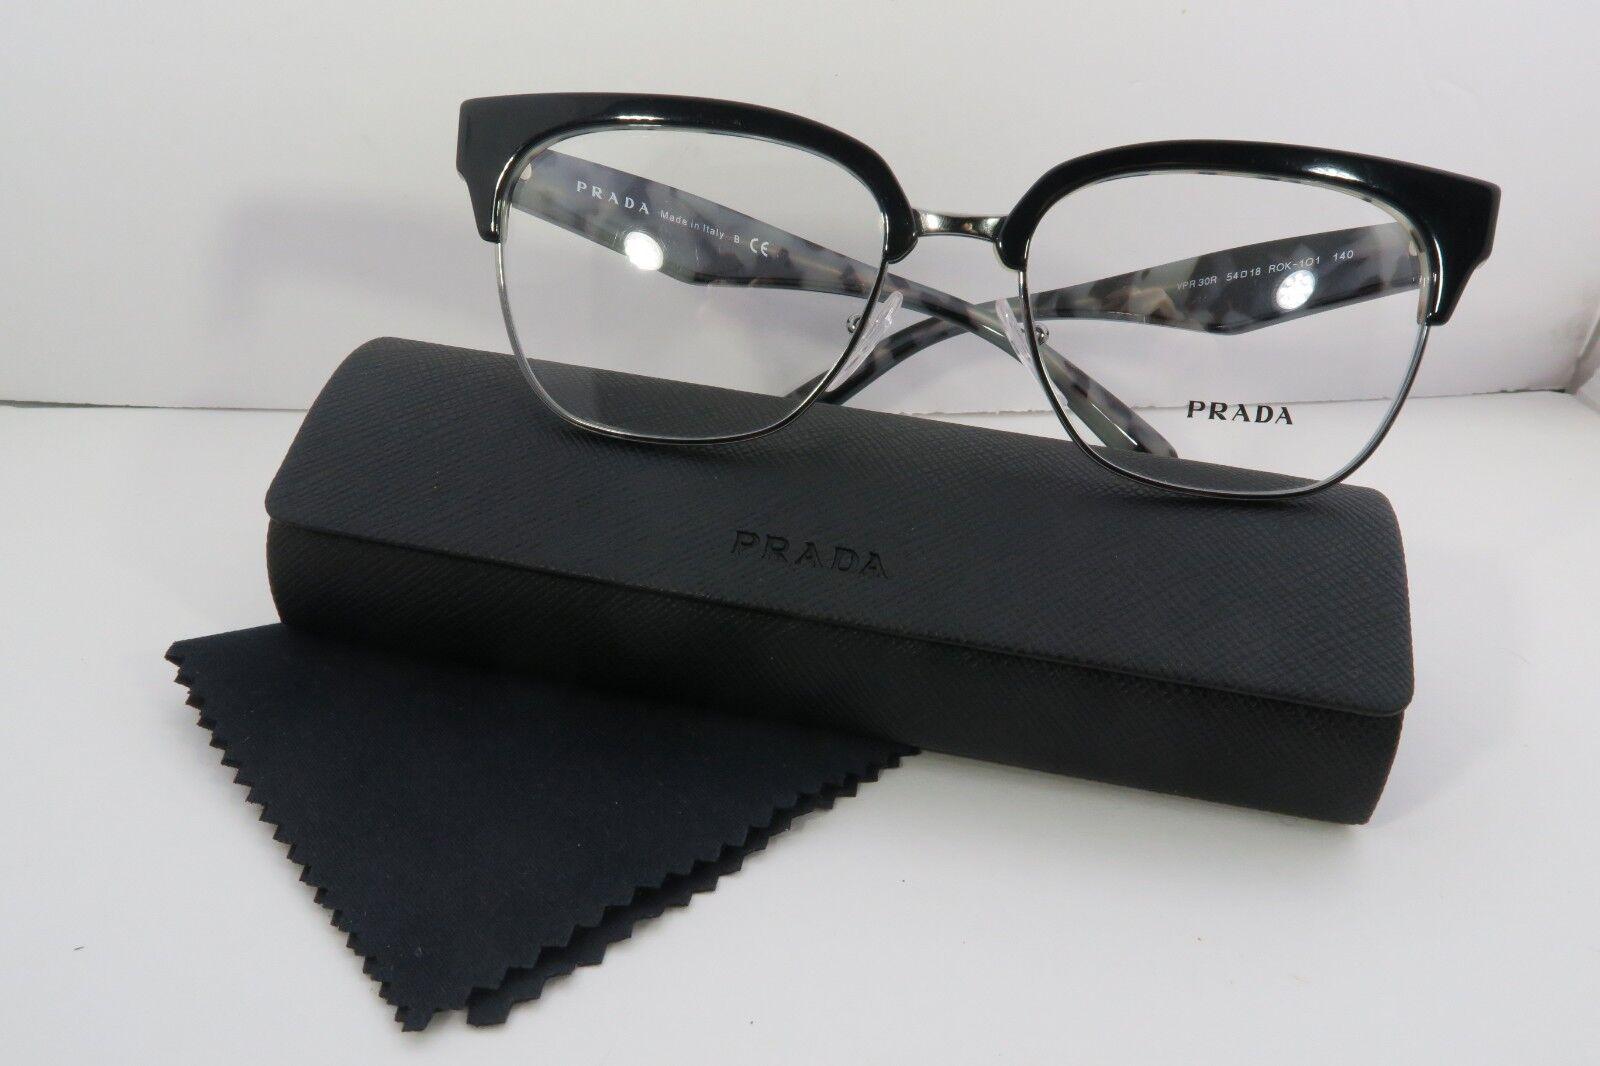 38b559deae54 Authentic PRADA Eyeglasses VPR 30r ROK Black DESIGNER Eyewear Frames ...